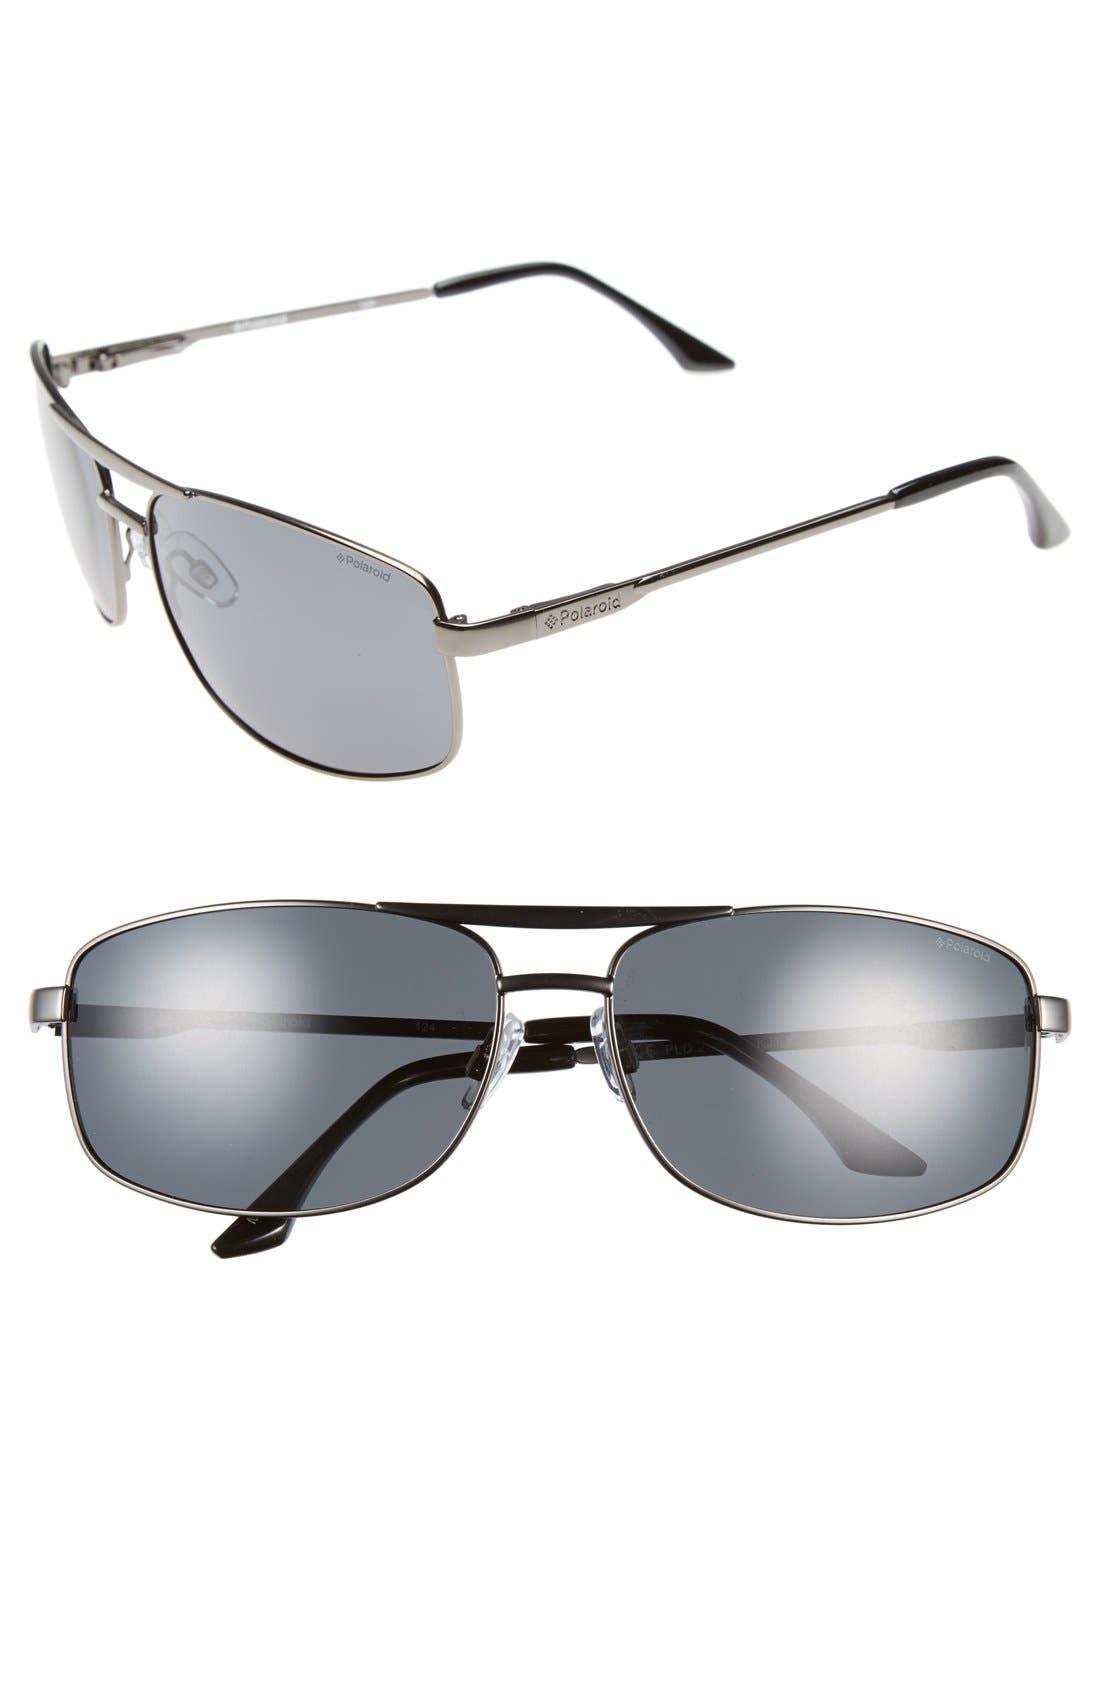 POLAROID EYEWEAR 2017S 65mm Polarized Navigator Sunglasses